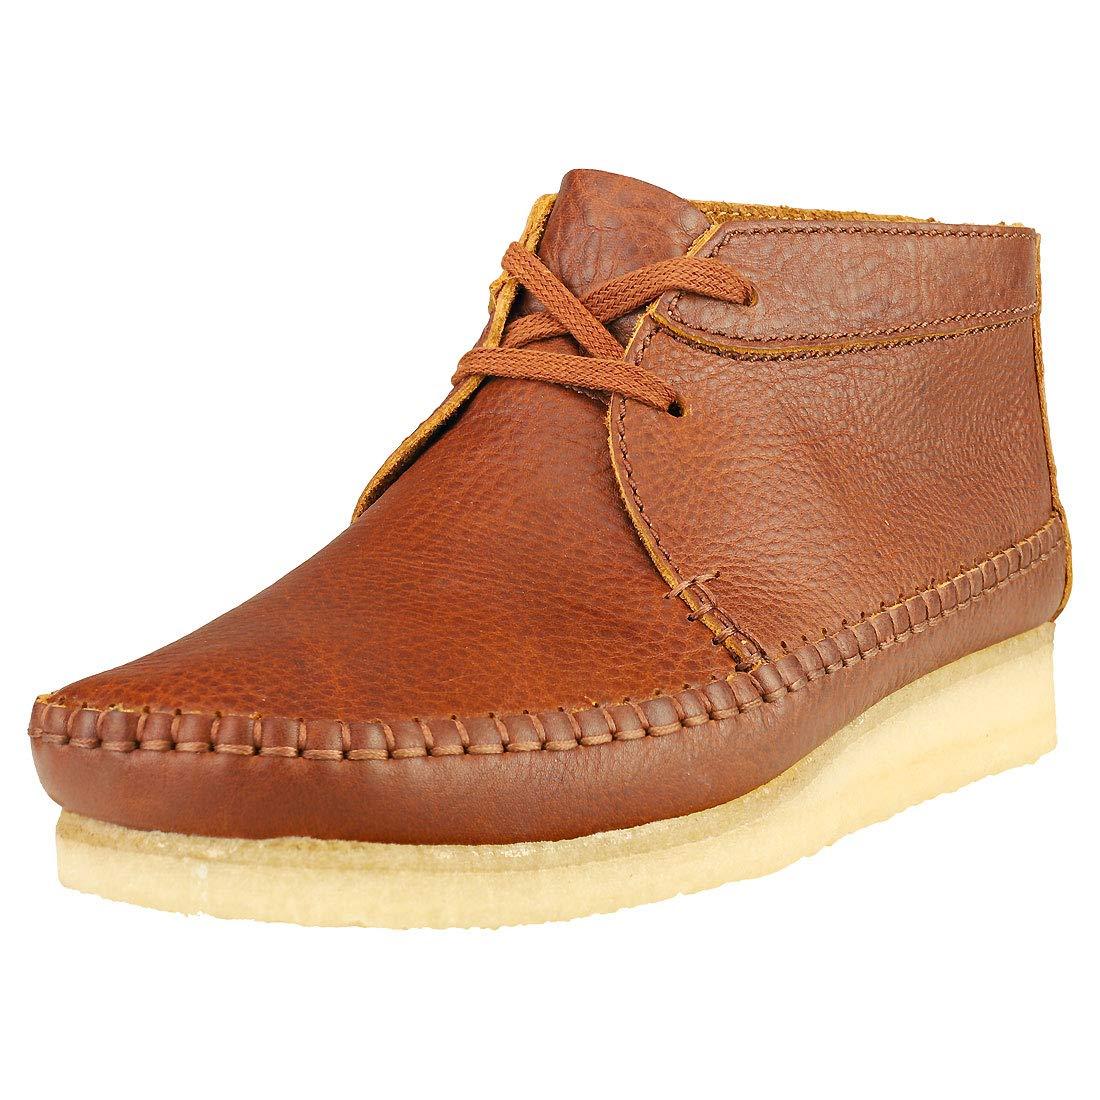 Clarks Originals Weaver Boot Boot Weaver (Tan Leather) b8a3eb